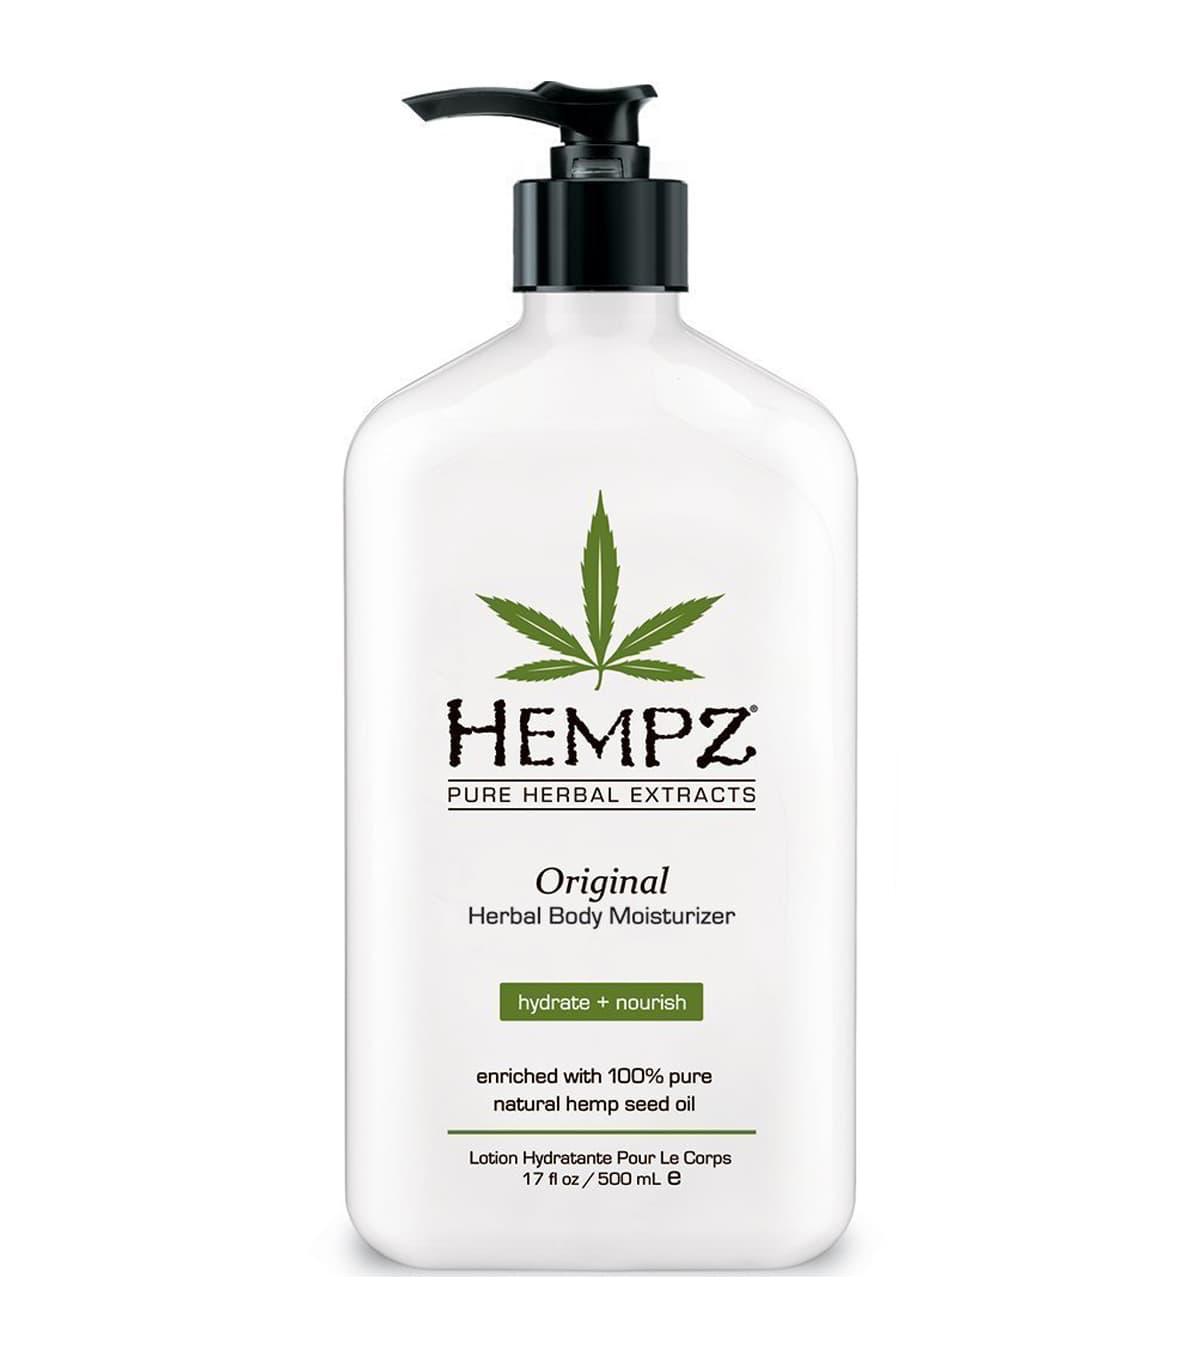 Hempz Original Herbal Body Moisturizer Молочко Для Тела Увлажняющее